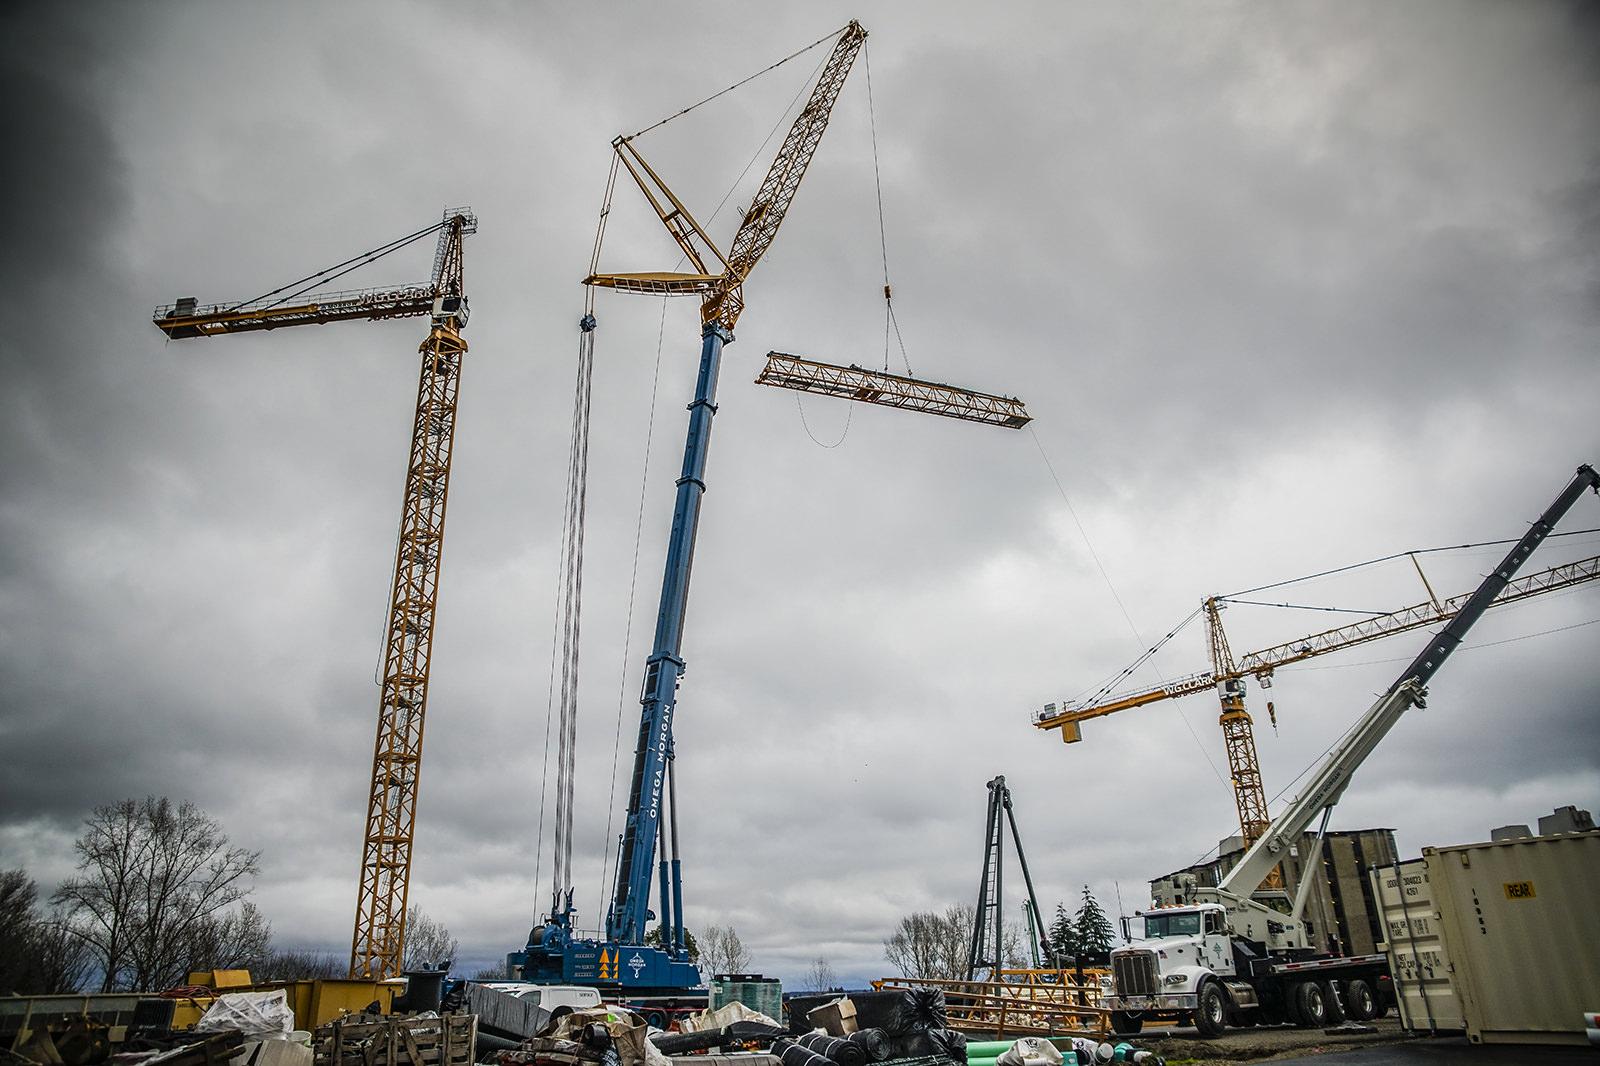 Hoisting inner jib of Liebherr 550 tower crane